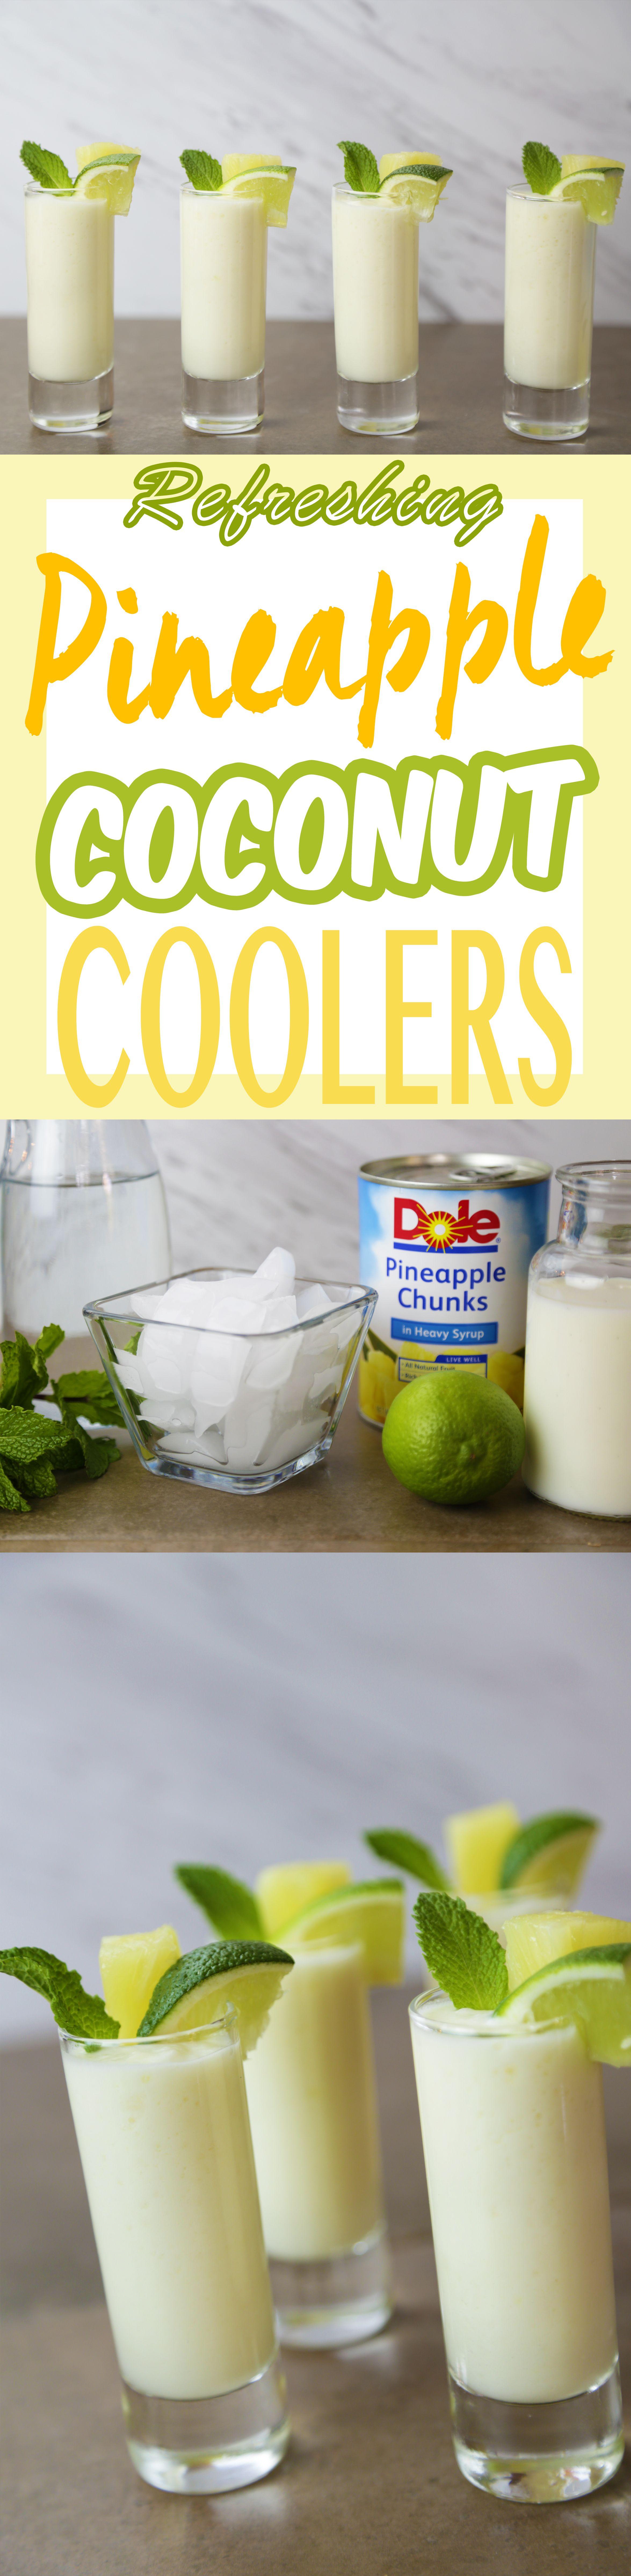 Pineapple Coconut Cooler Shots | Recipe | Lime juice, Coconut milk ...